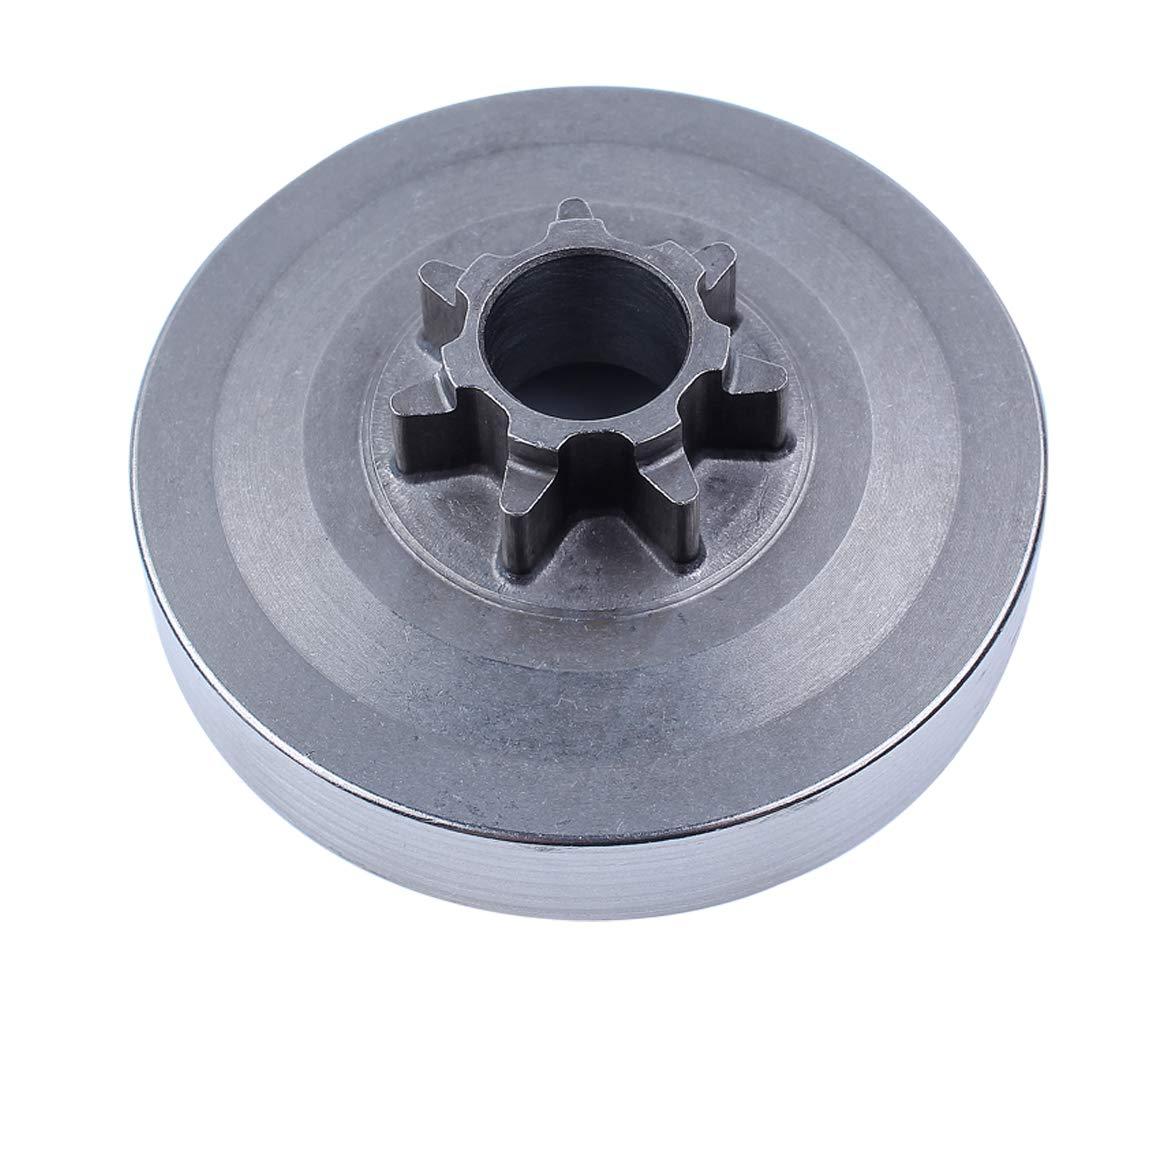 Haishine .325 Kit de Bomba de Aceite del Tambor de Embrague Fit Chino 45cc 52cc 58cc 4500 5200 5800 Motosierra